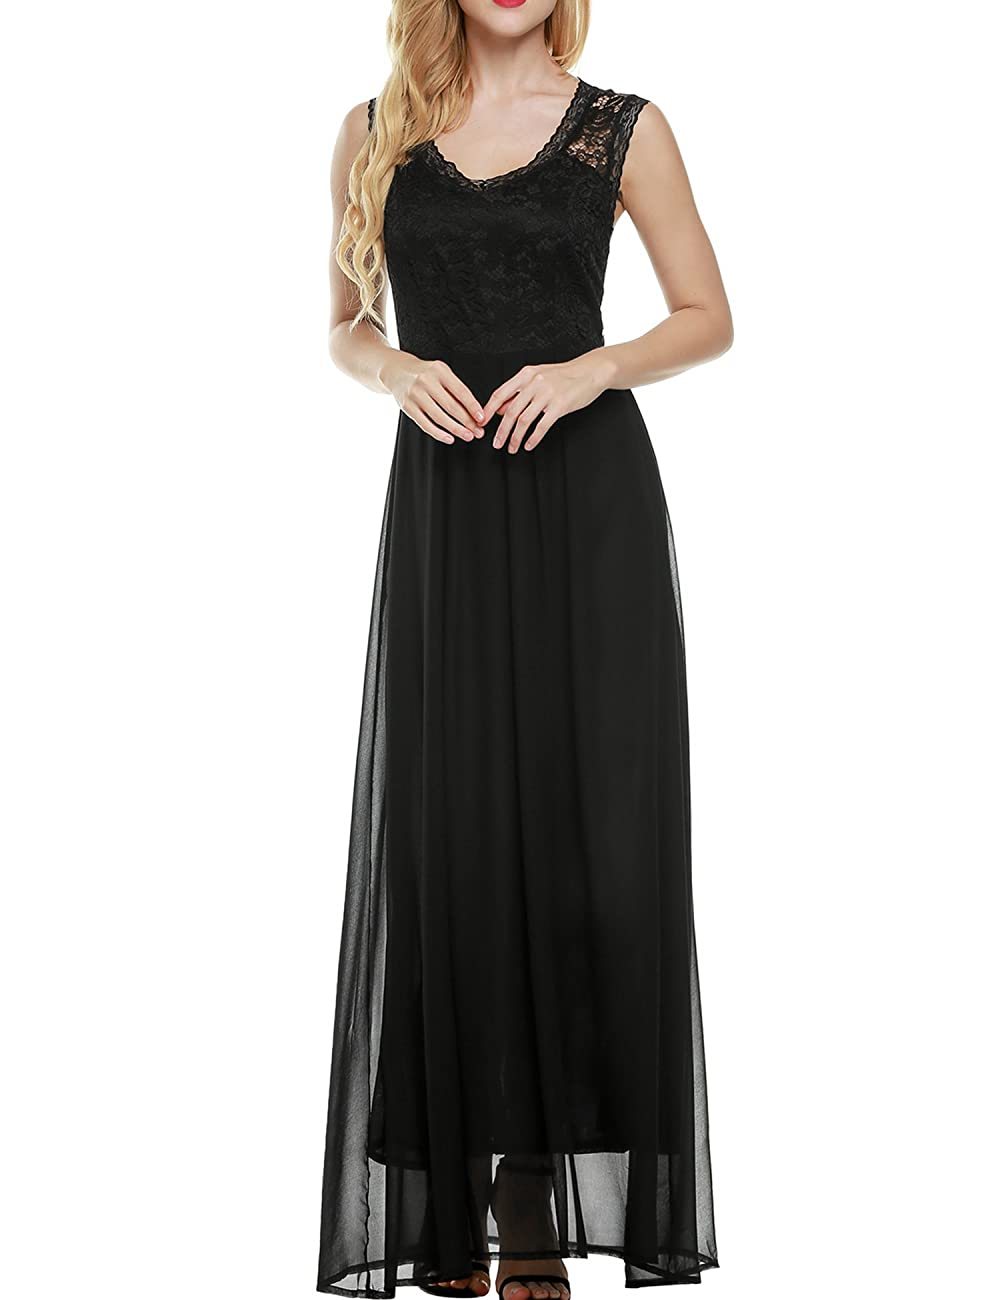 ANGVNS Women's Casual Deep- V Neck Sleeveless Vintage Maxi Dress 1